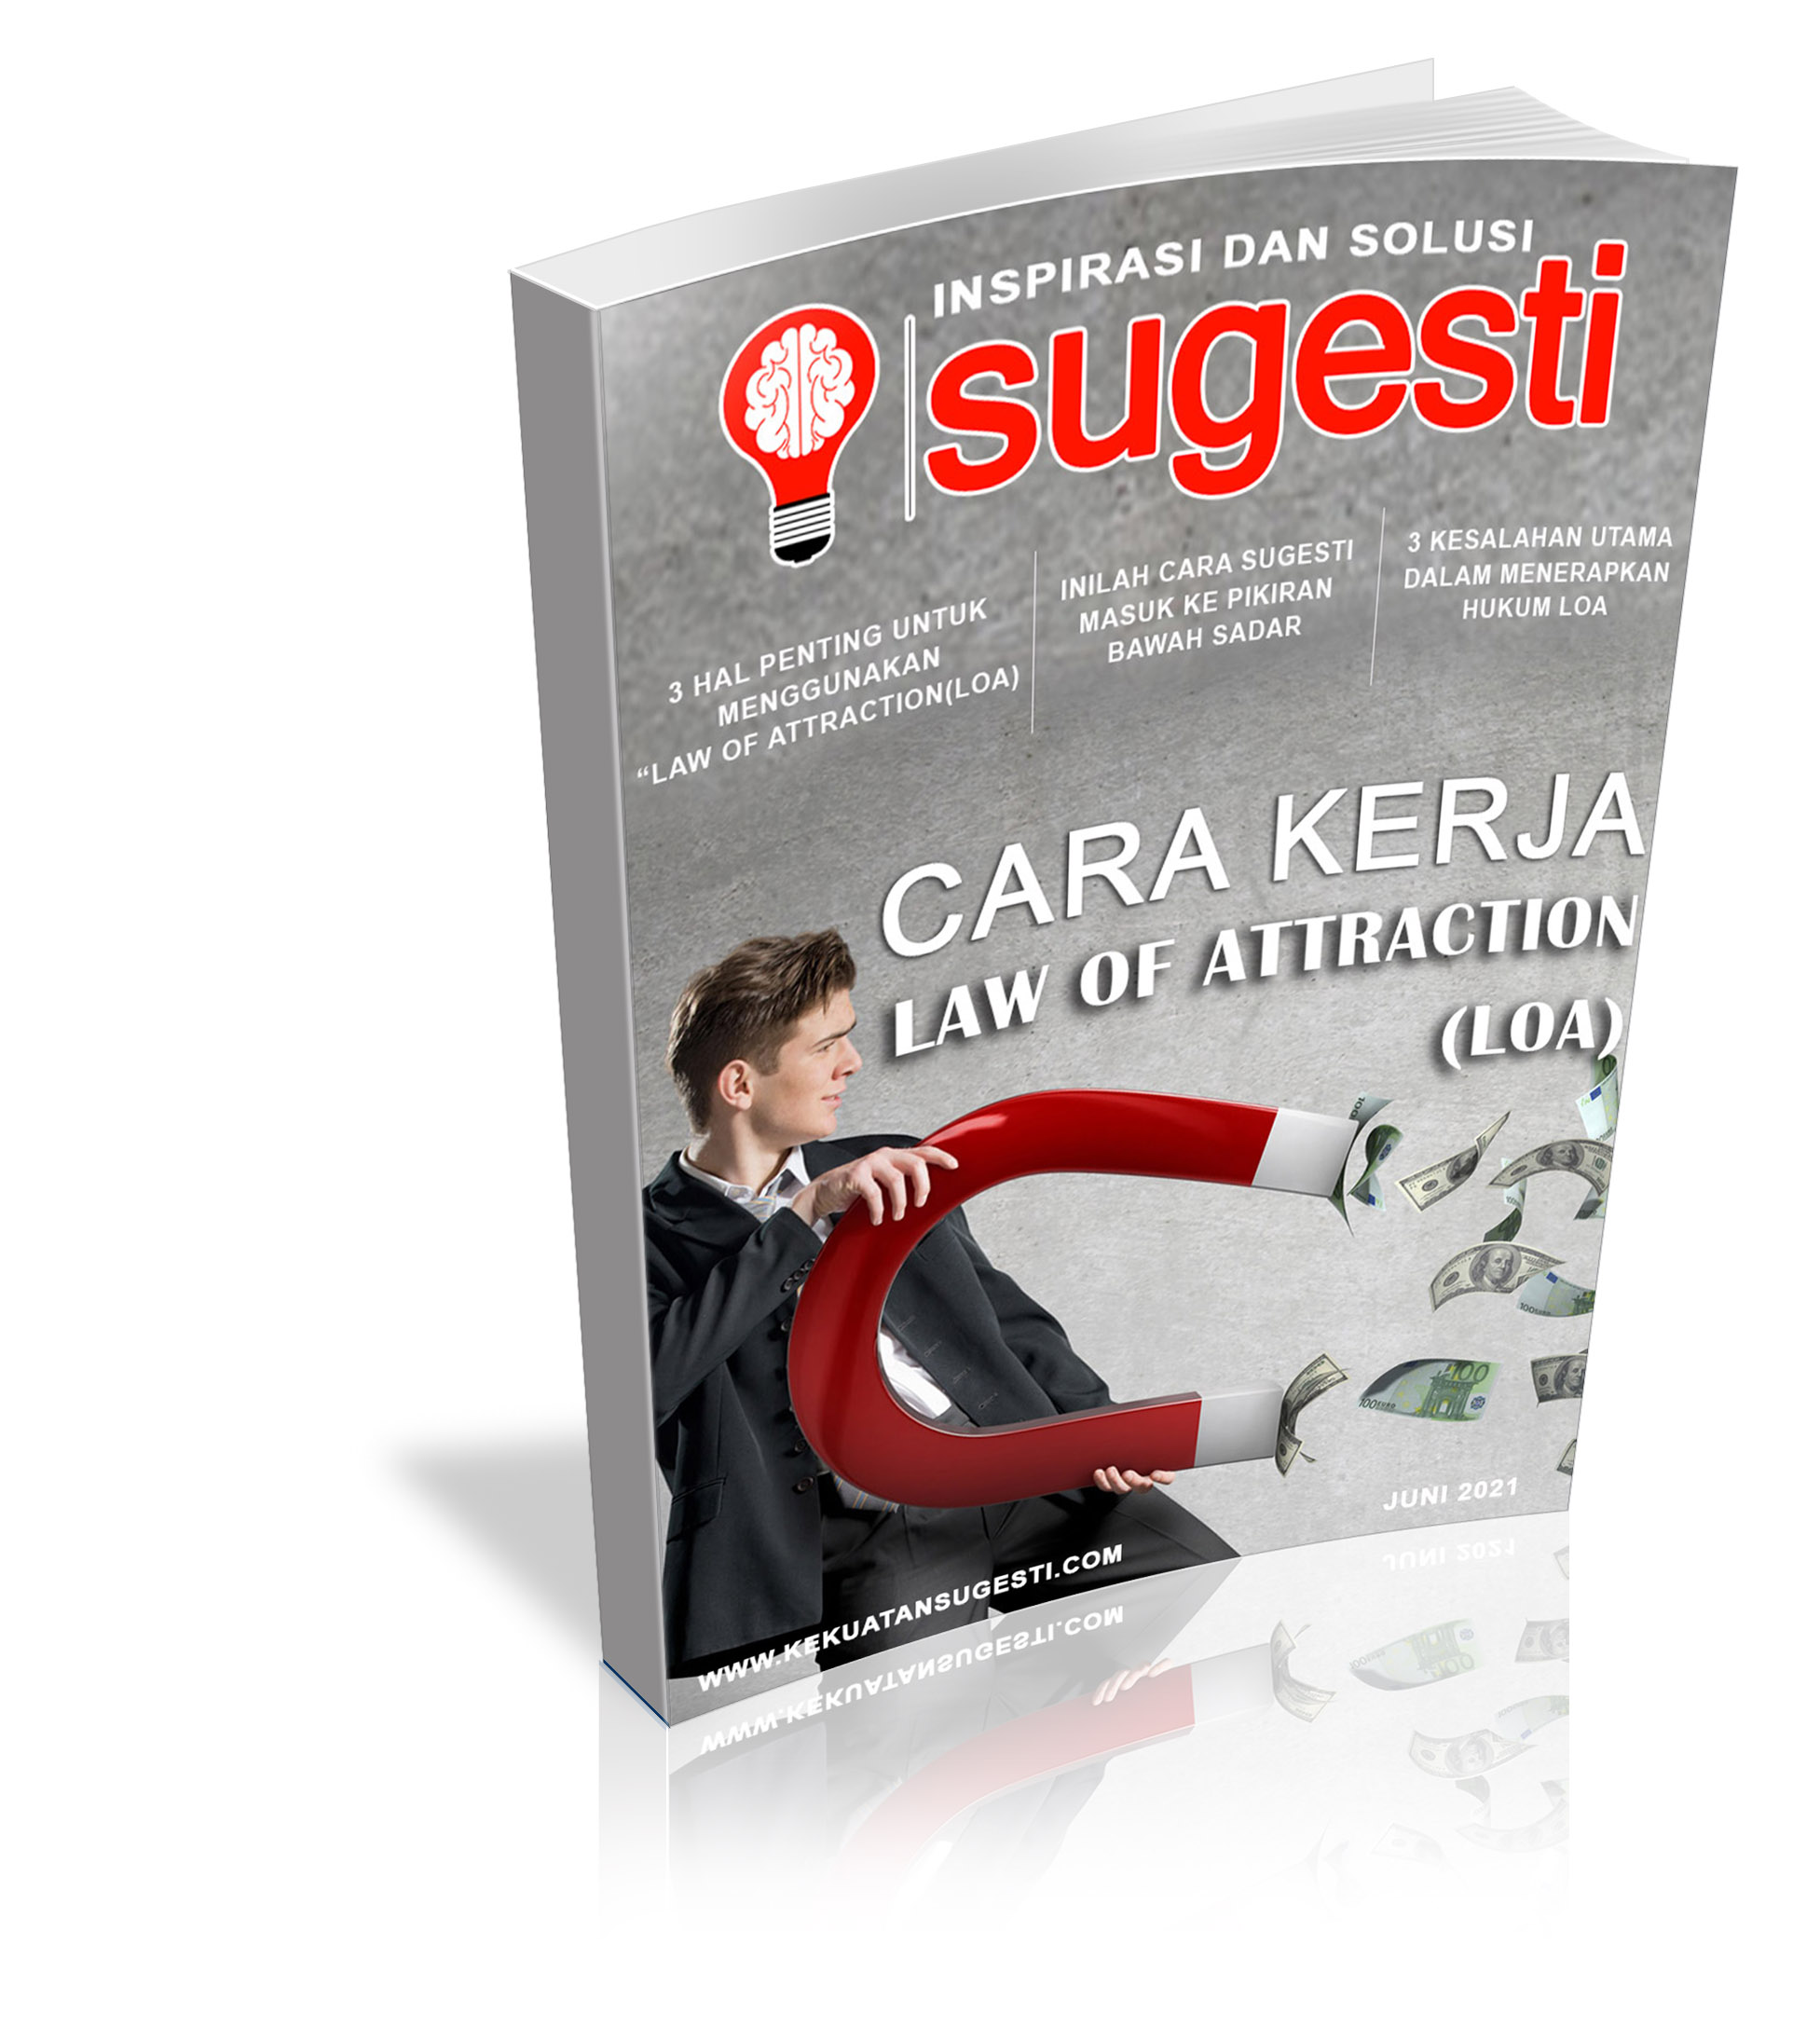 Majalah Sugesti Edisi ke Delapanpuluh Empat Bulan Juni 2021